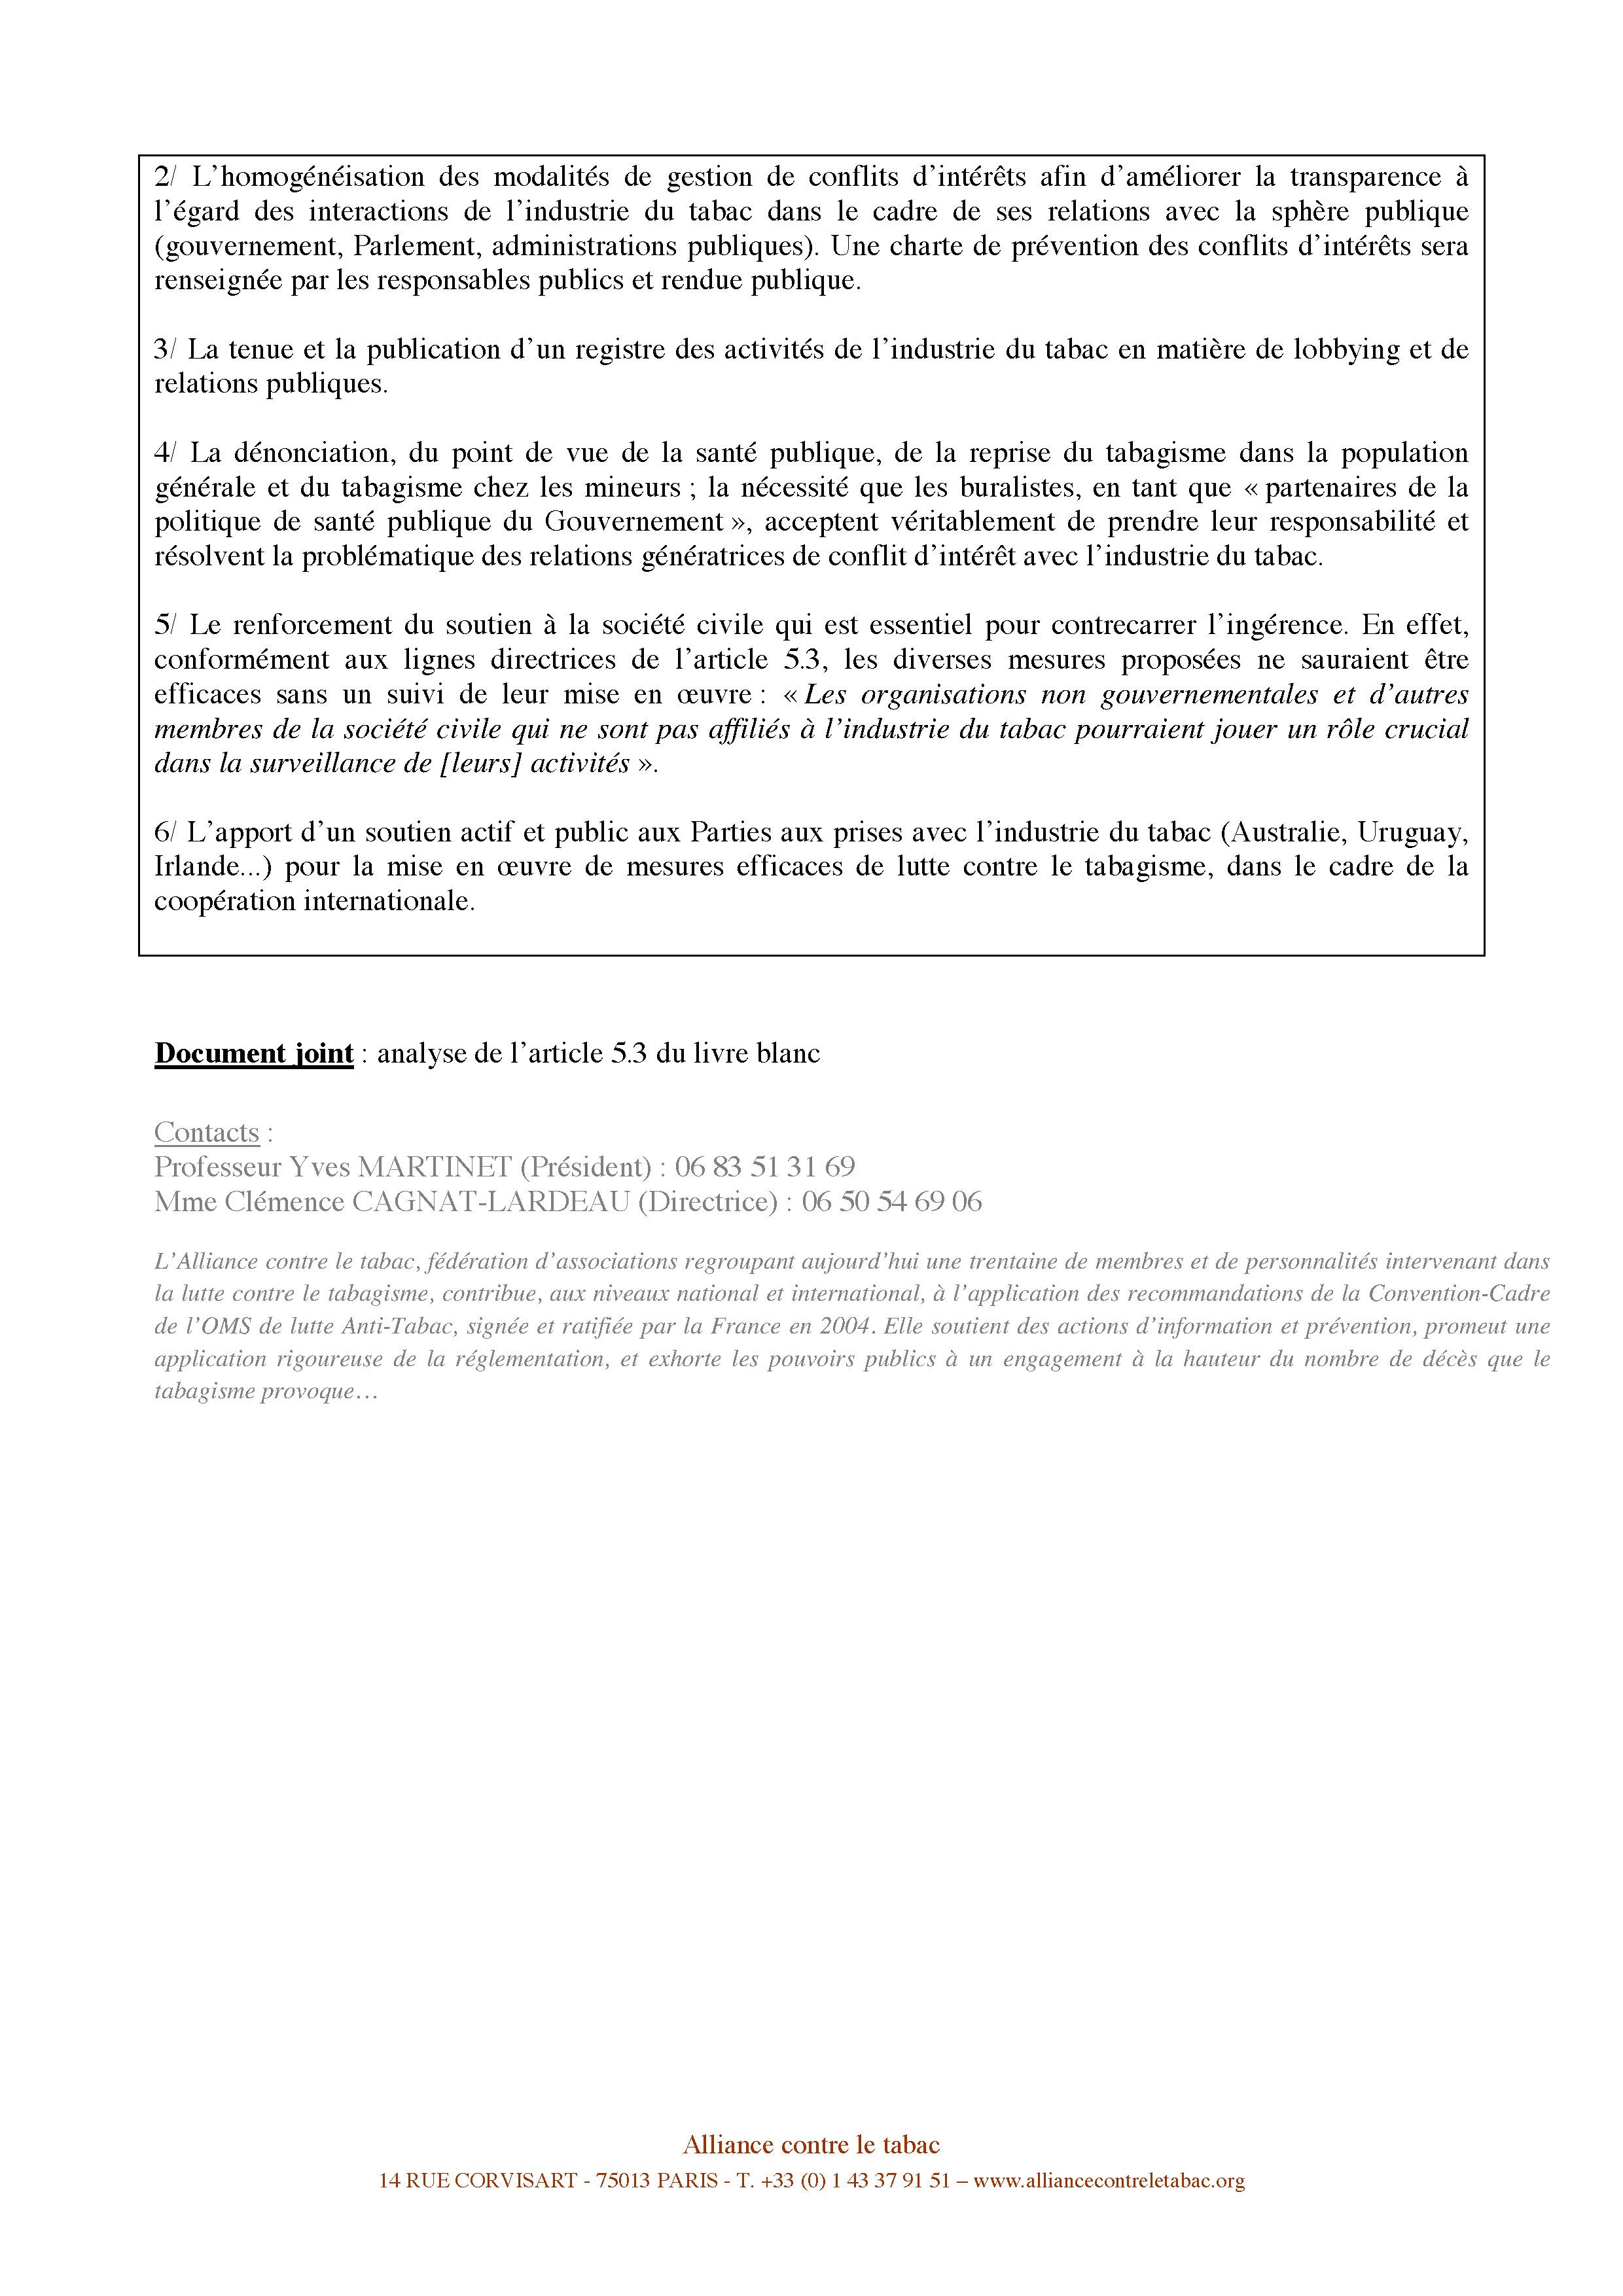 Alliance-CP_journee-mondiale-sans-tabac-31mai2012_Page_2.jpg